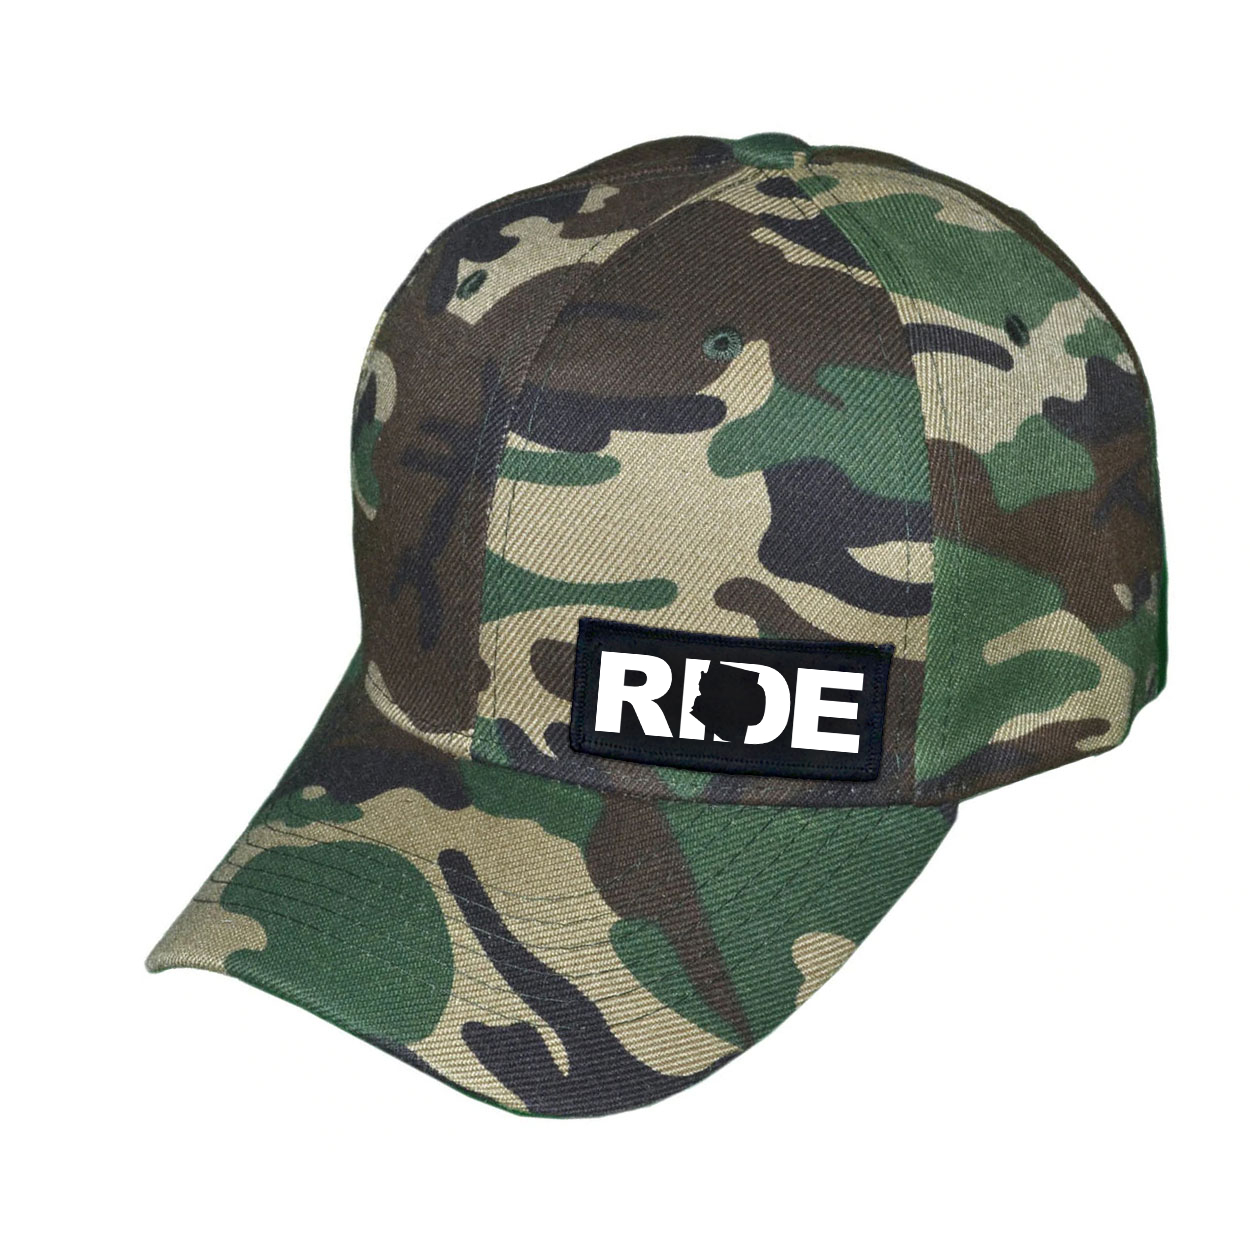 Ride Arizona Night Out Woven Patch Hat Camo (White Logo)